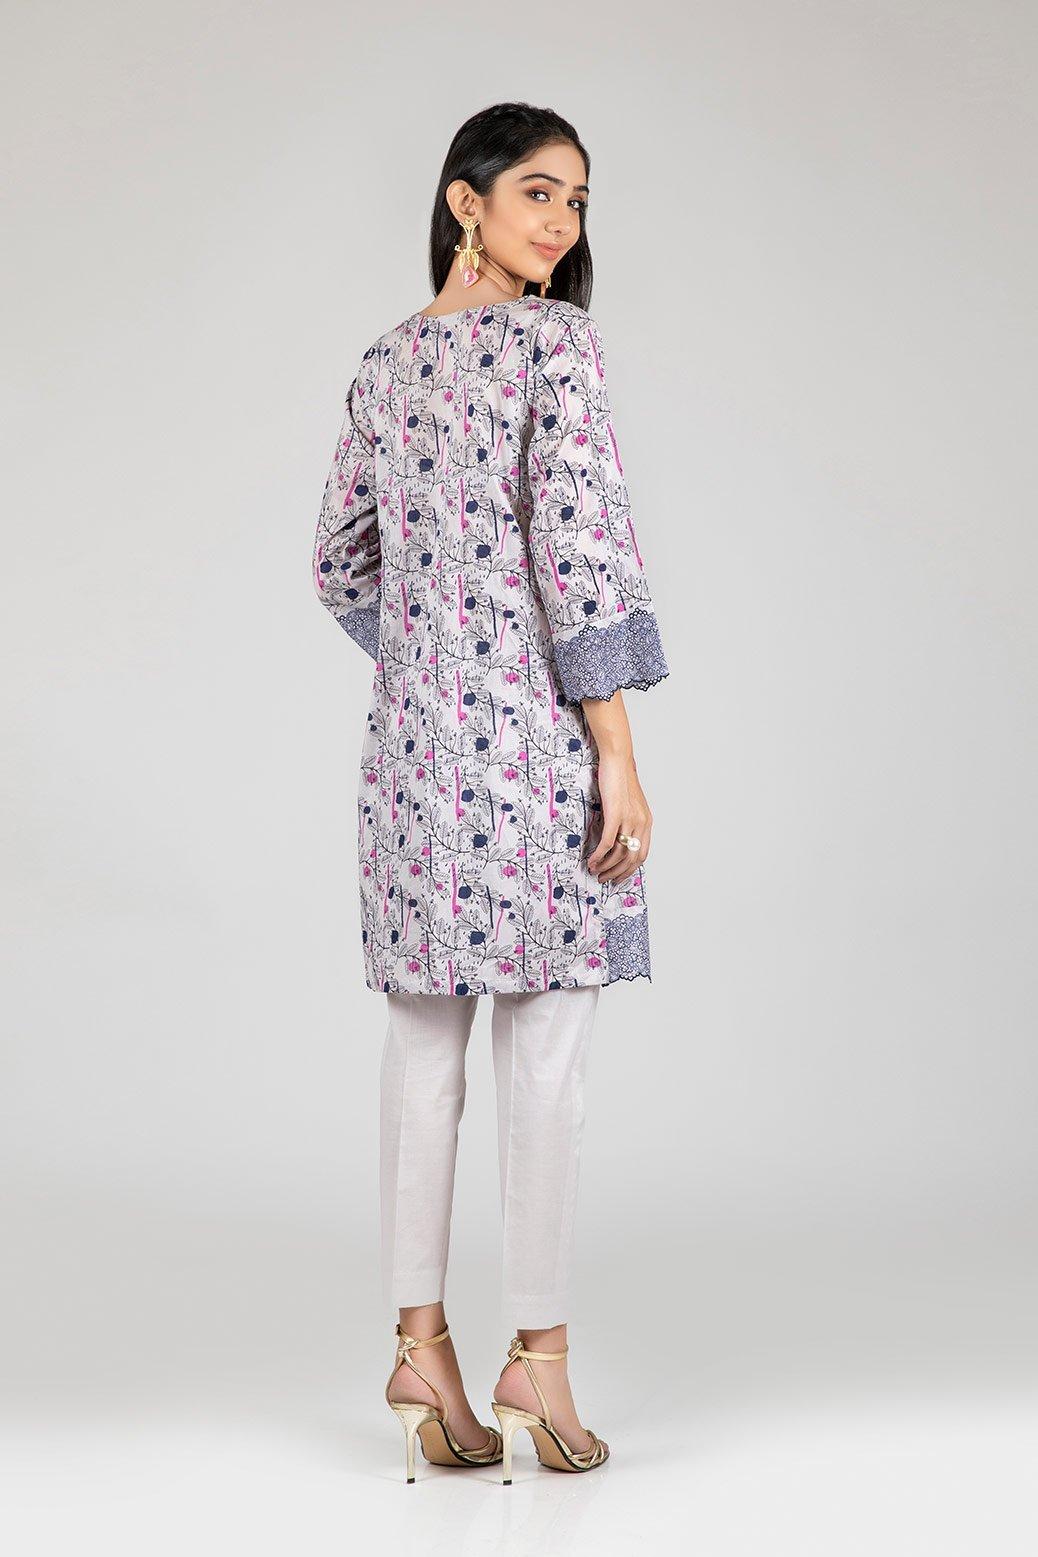 Bonanza Satrangi Two Piece Dress Beige color back-side